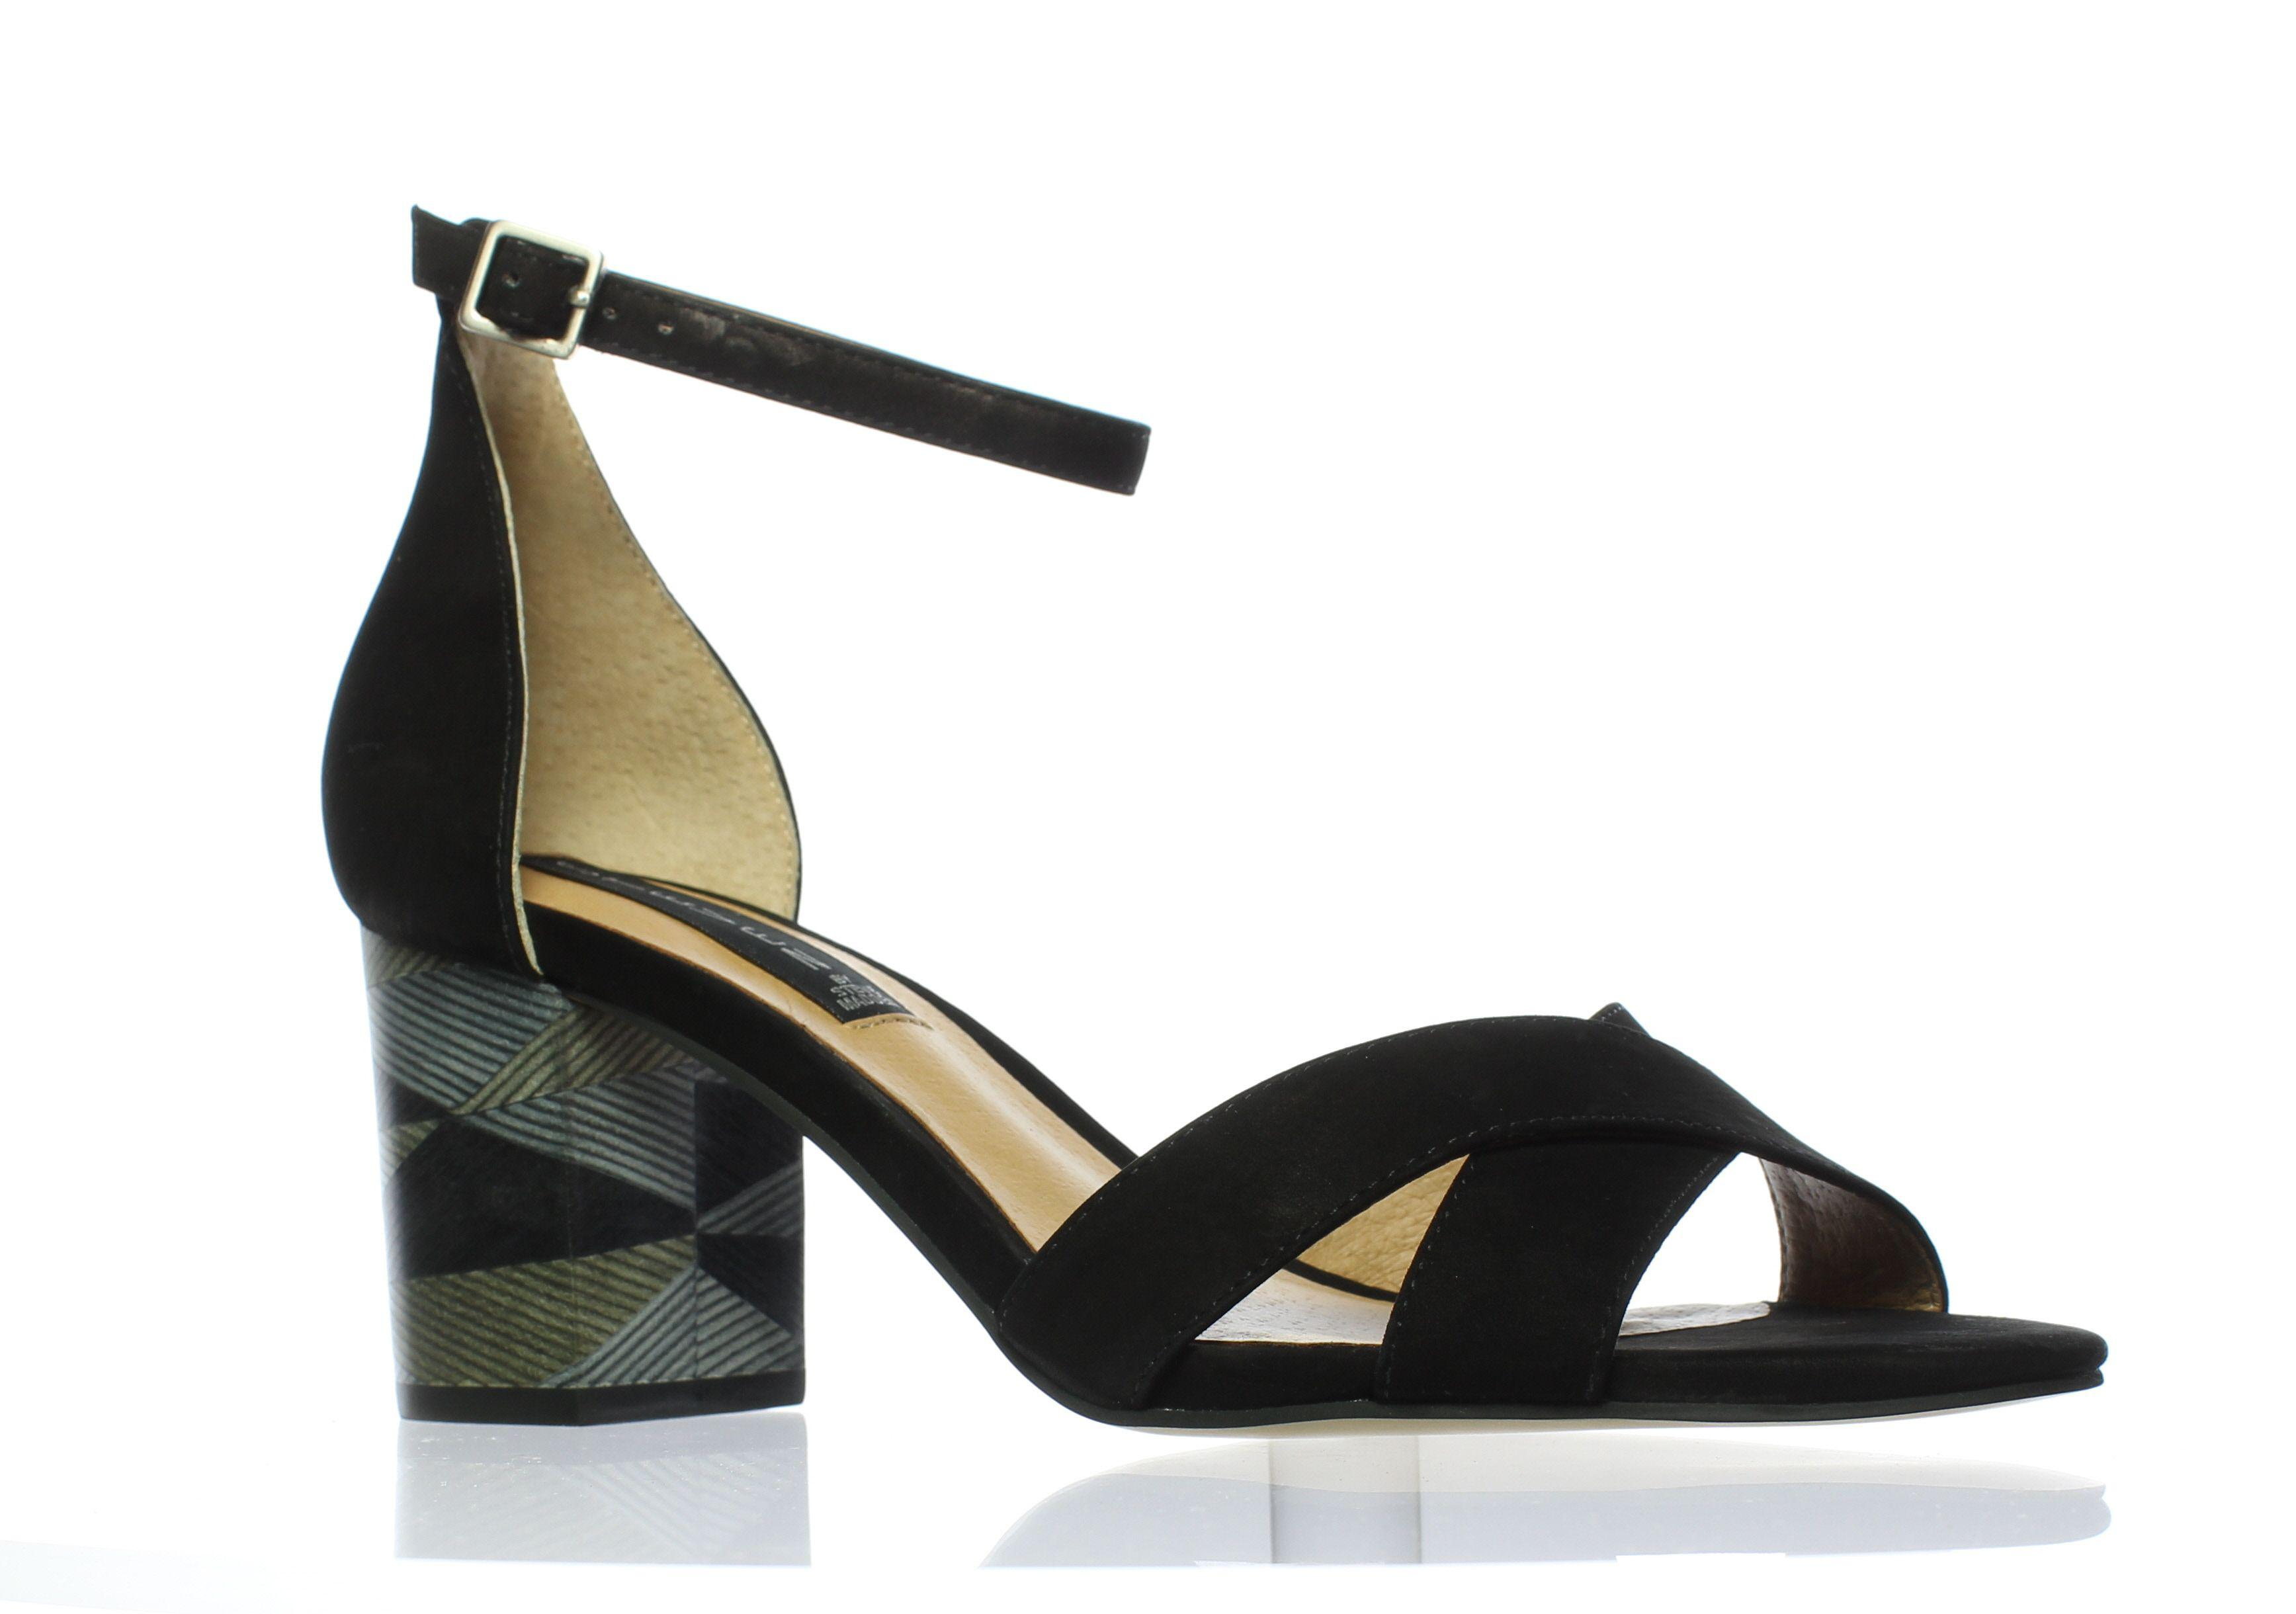 1e53abe30257 Lyst - Steve Madden Womens Voomme-s Black Nubuck Peep Toe Heels in Black